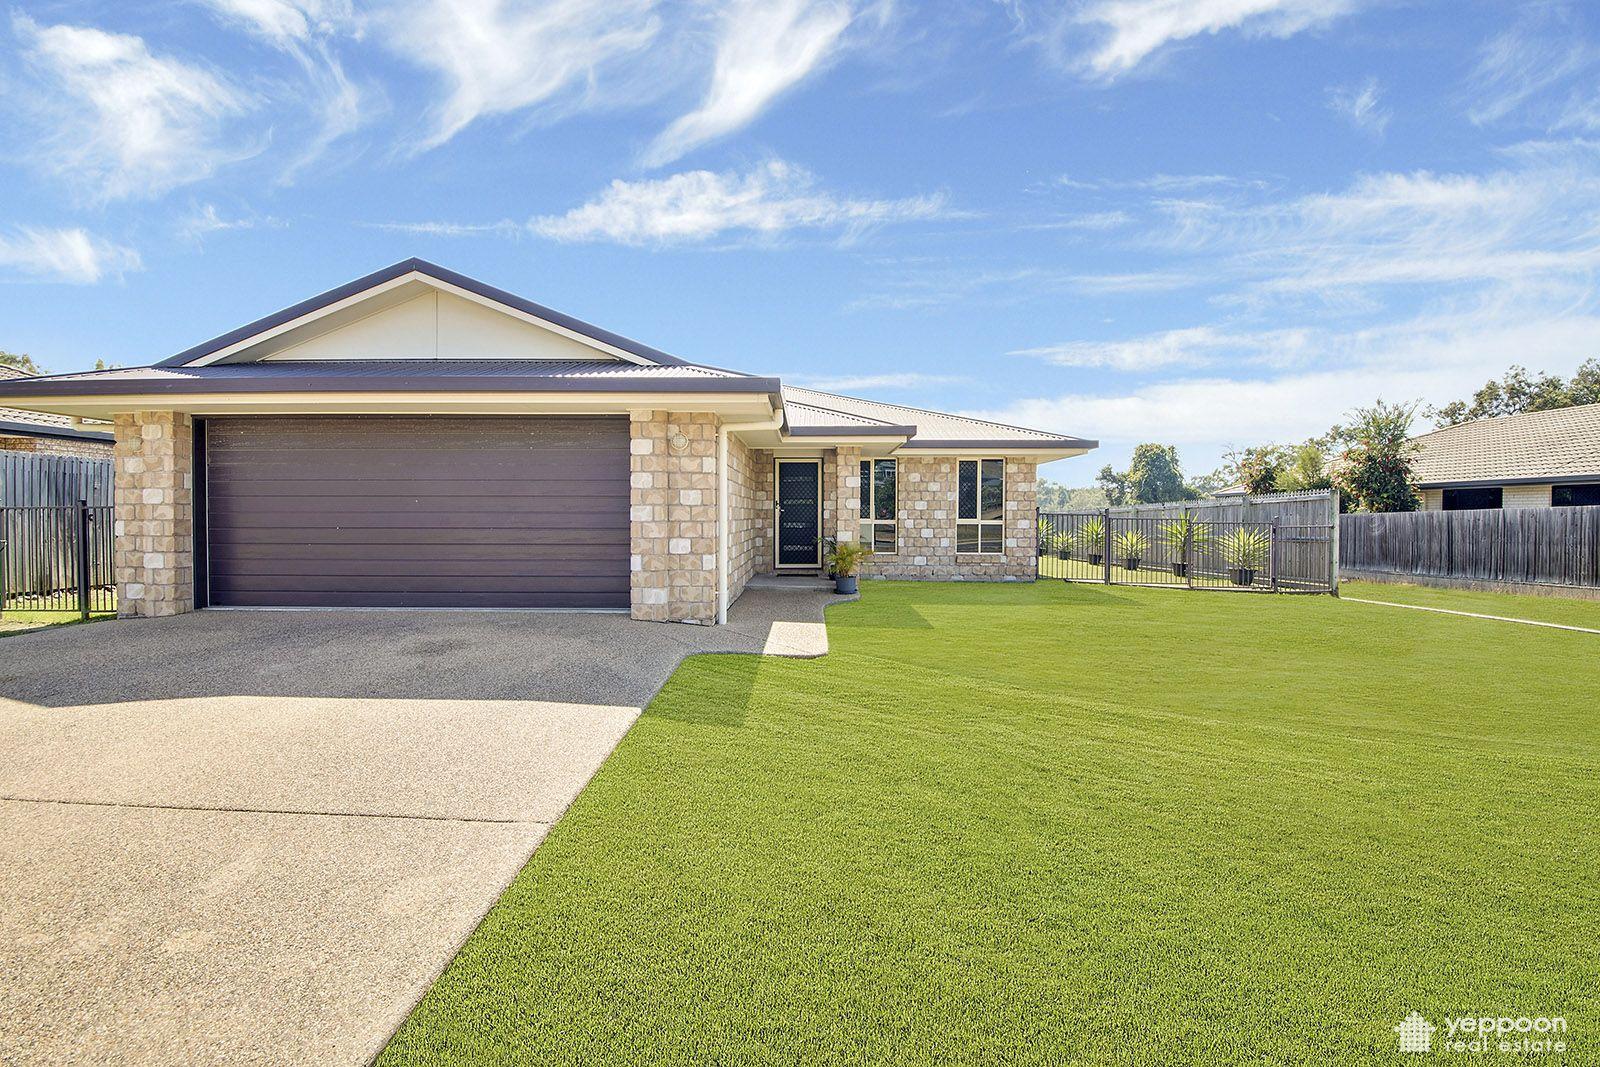 67 Bottlebrush Drive, Lammermoor QLD 4703, Image 0